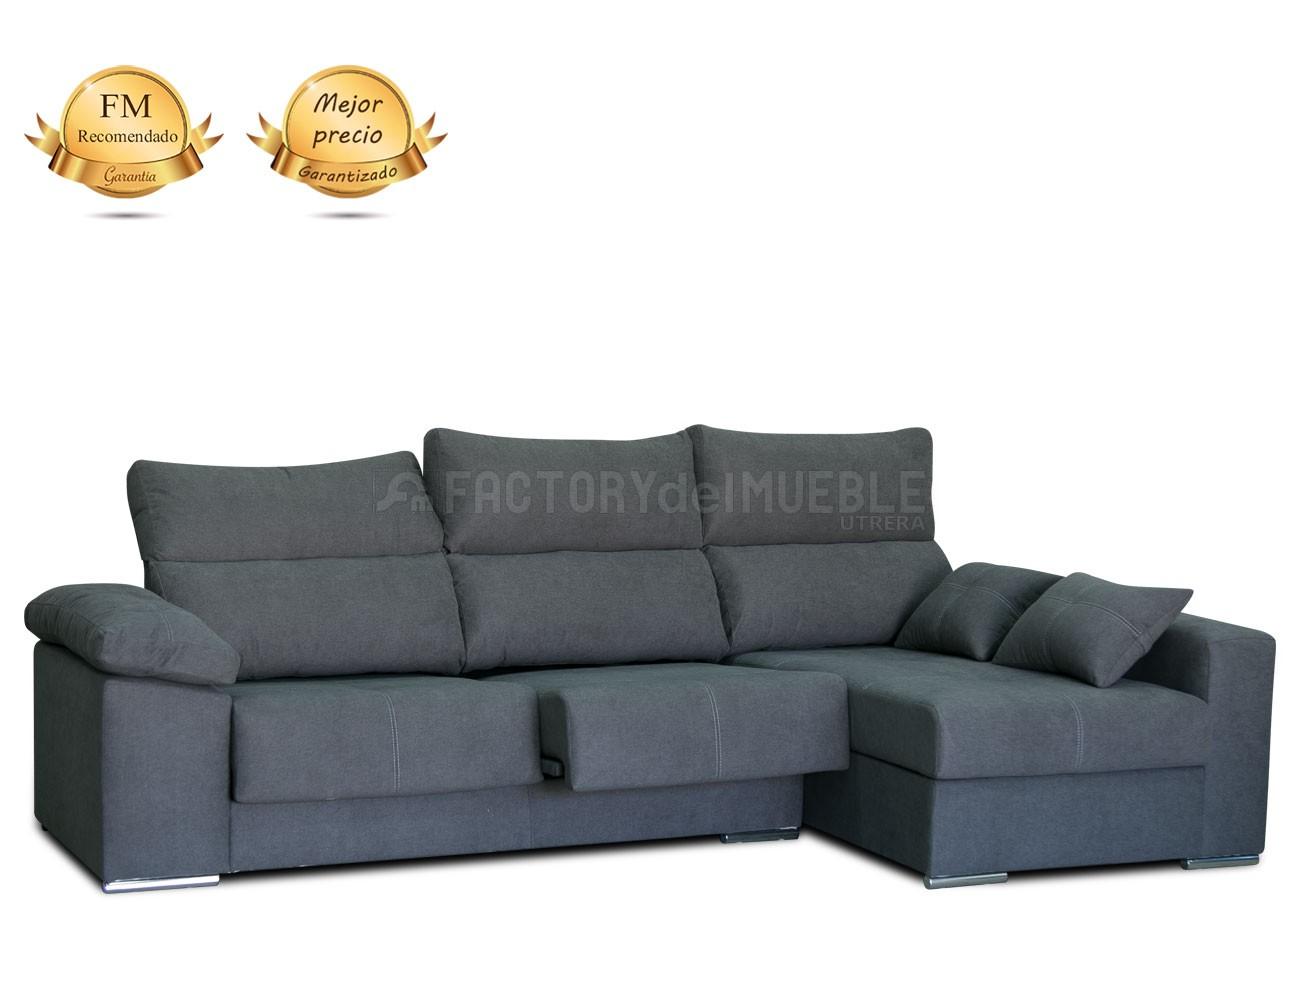 Sofa chaiselongue recomendado1